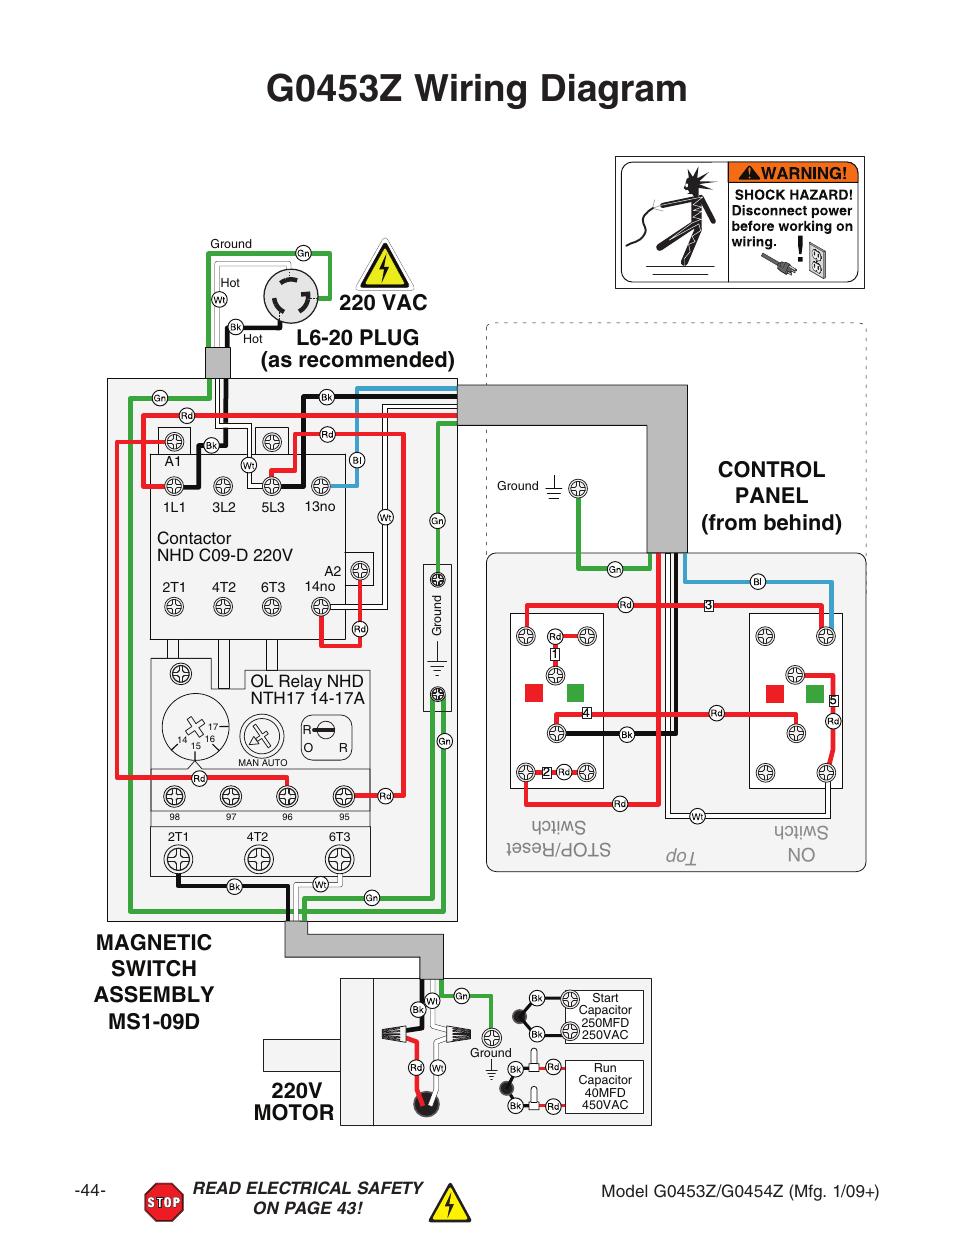 Ridgid 4 Wire 220v Plug Wiring Diagram A Receptacle